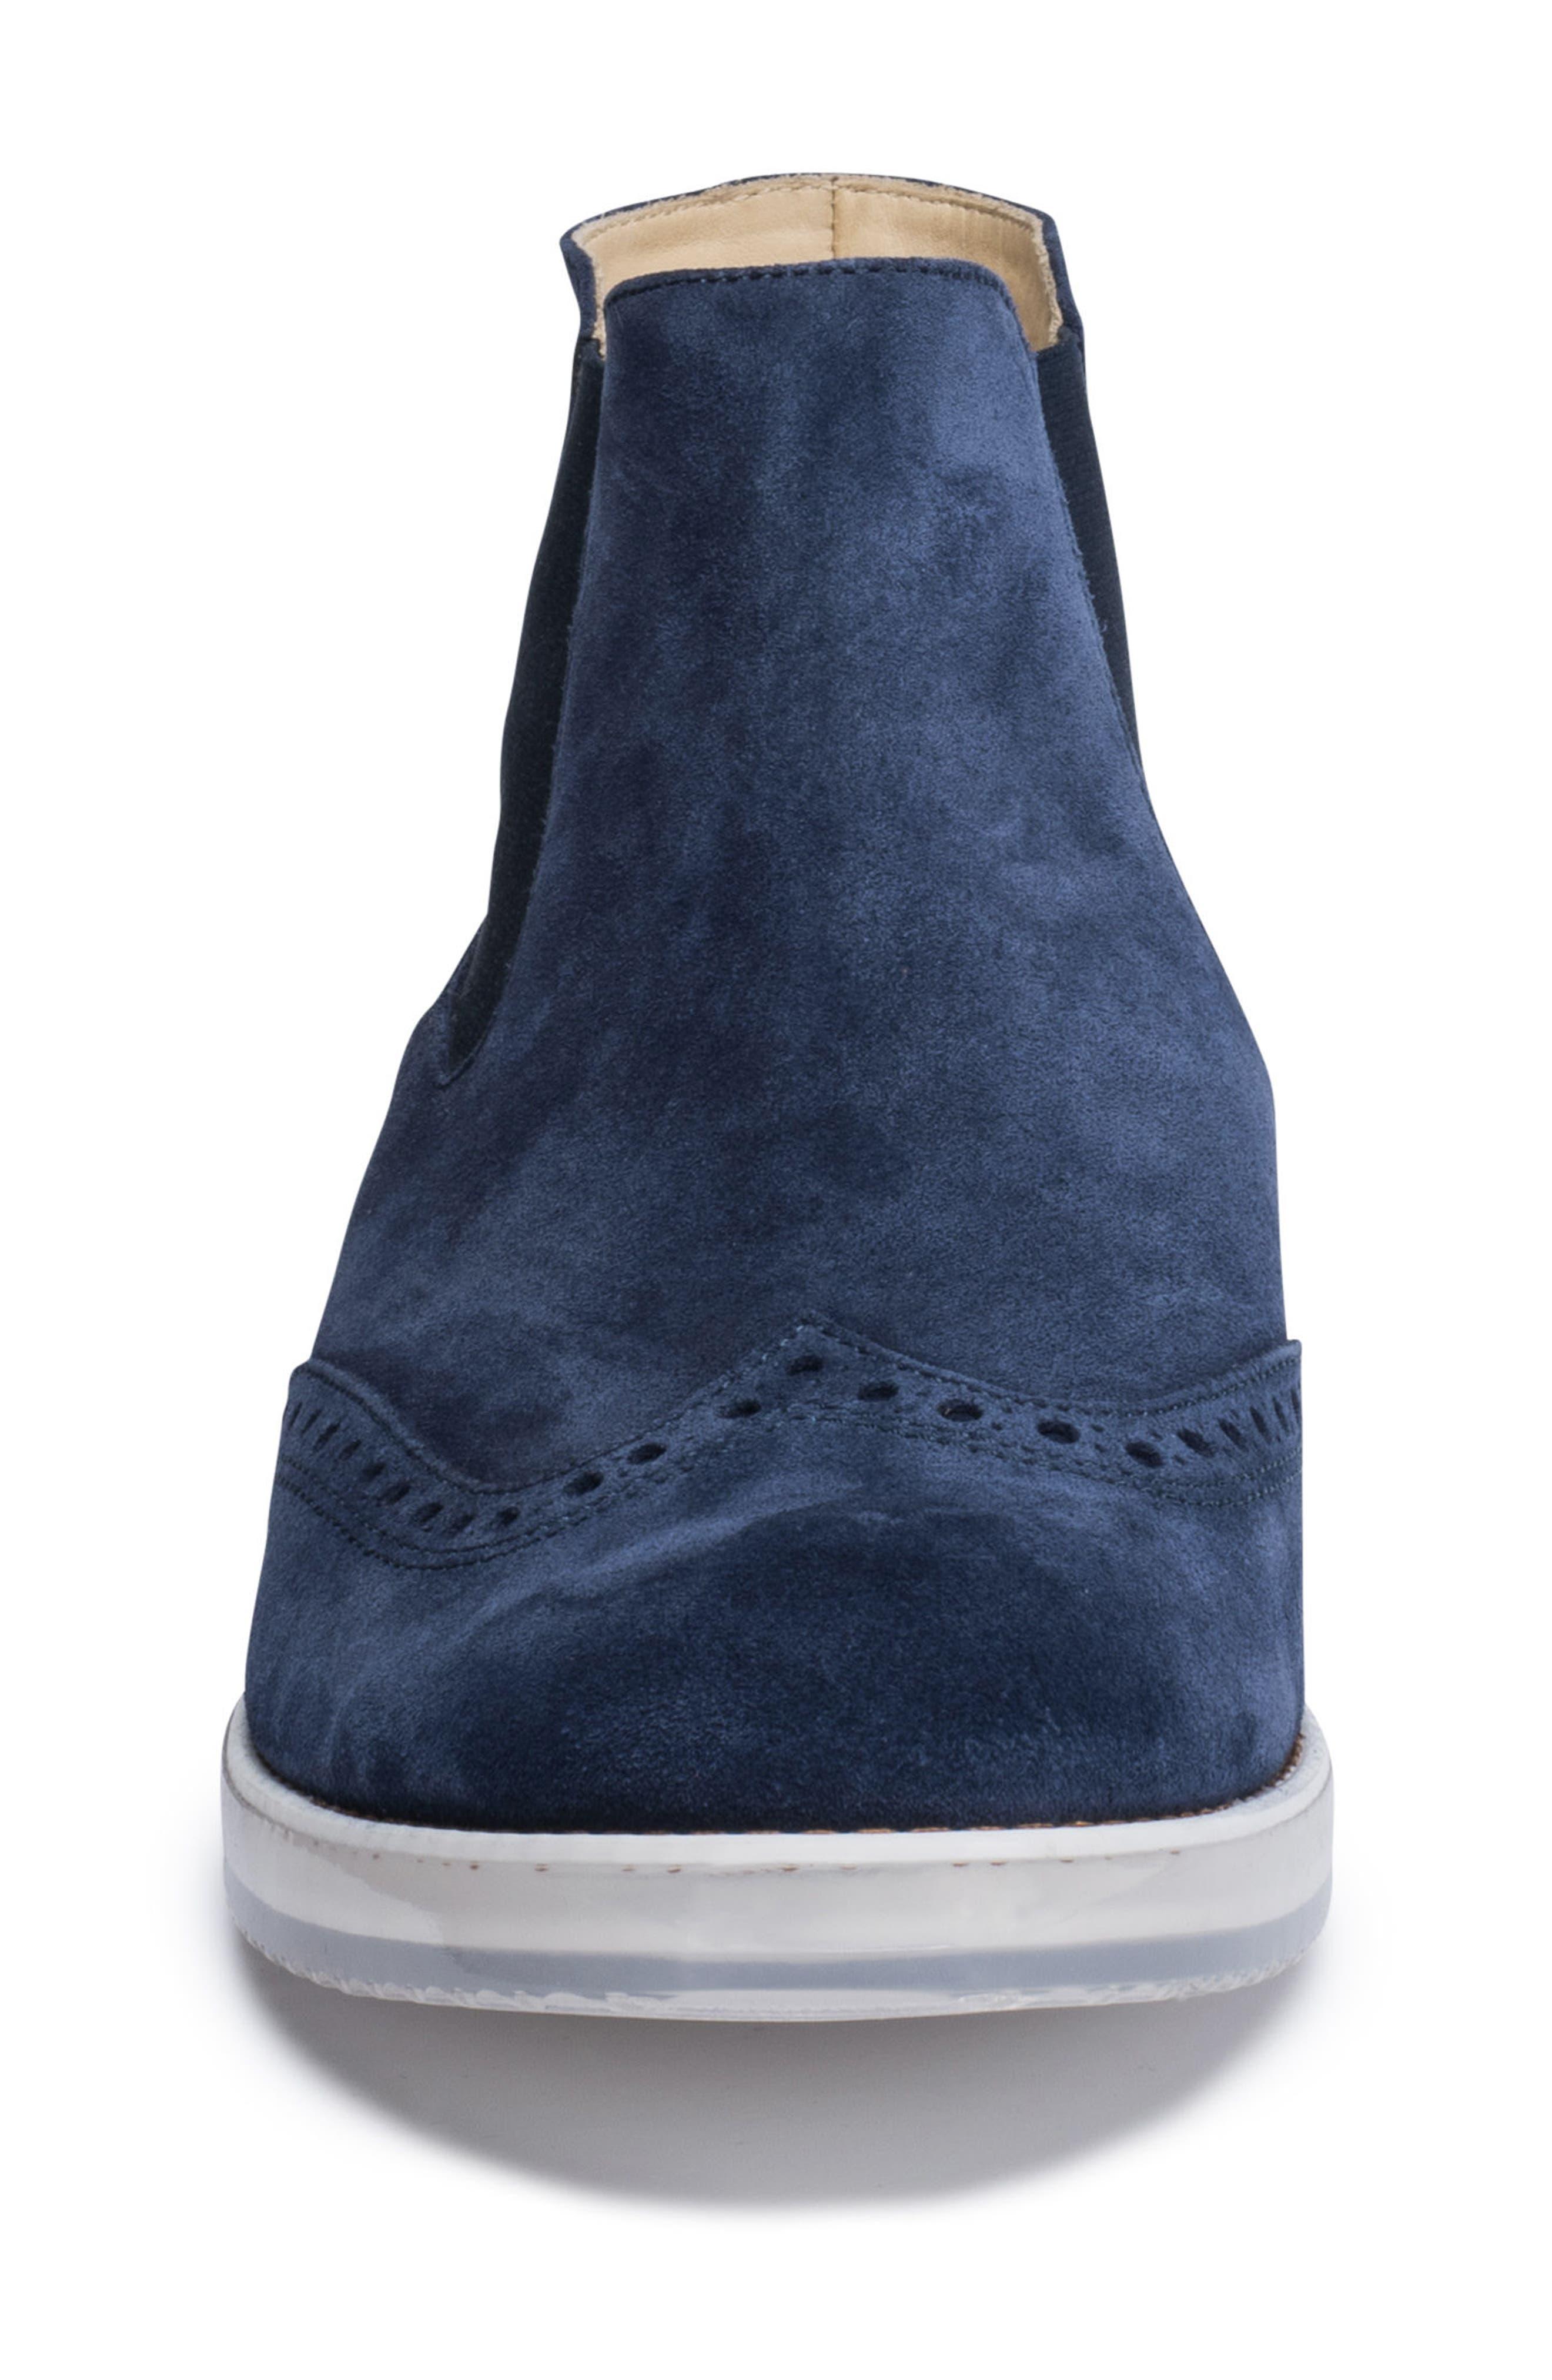 Brescia Mid Chelsea Wingtip Sneaker Boot,                             Alternate thumbnail 4, color,                             429